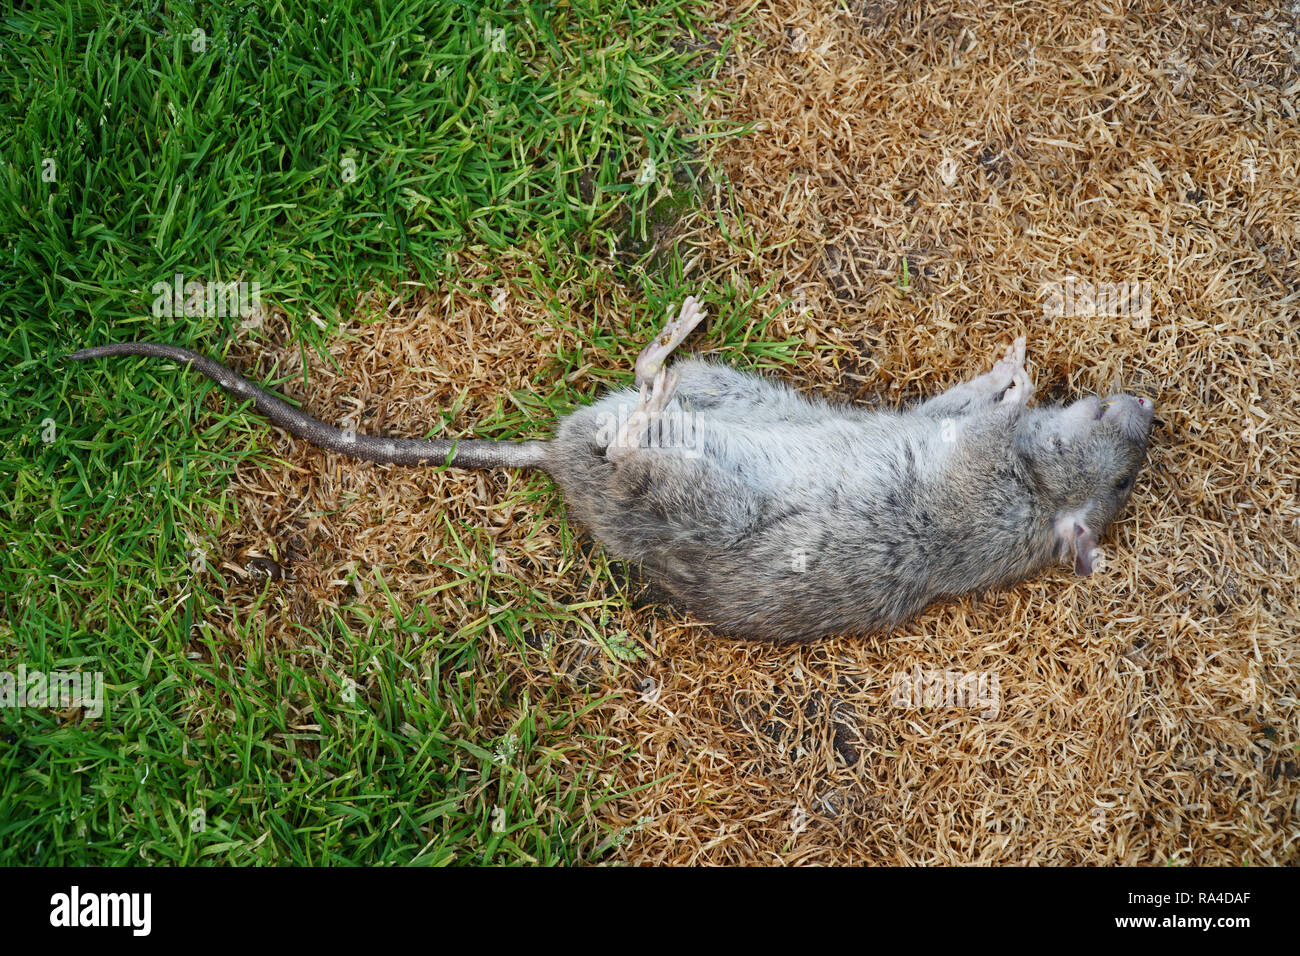 Dead brown rat or rattus norvegicus on grass - Stock Image